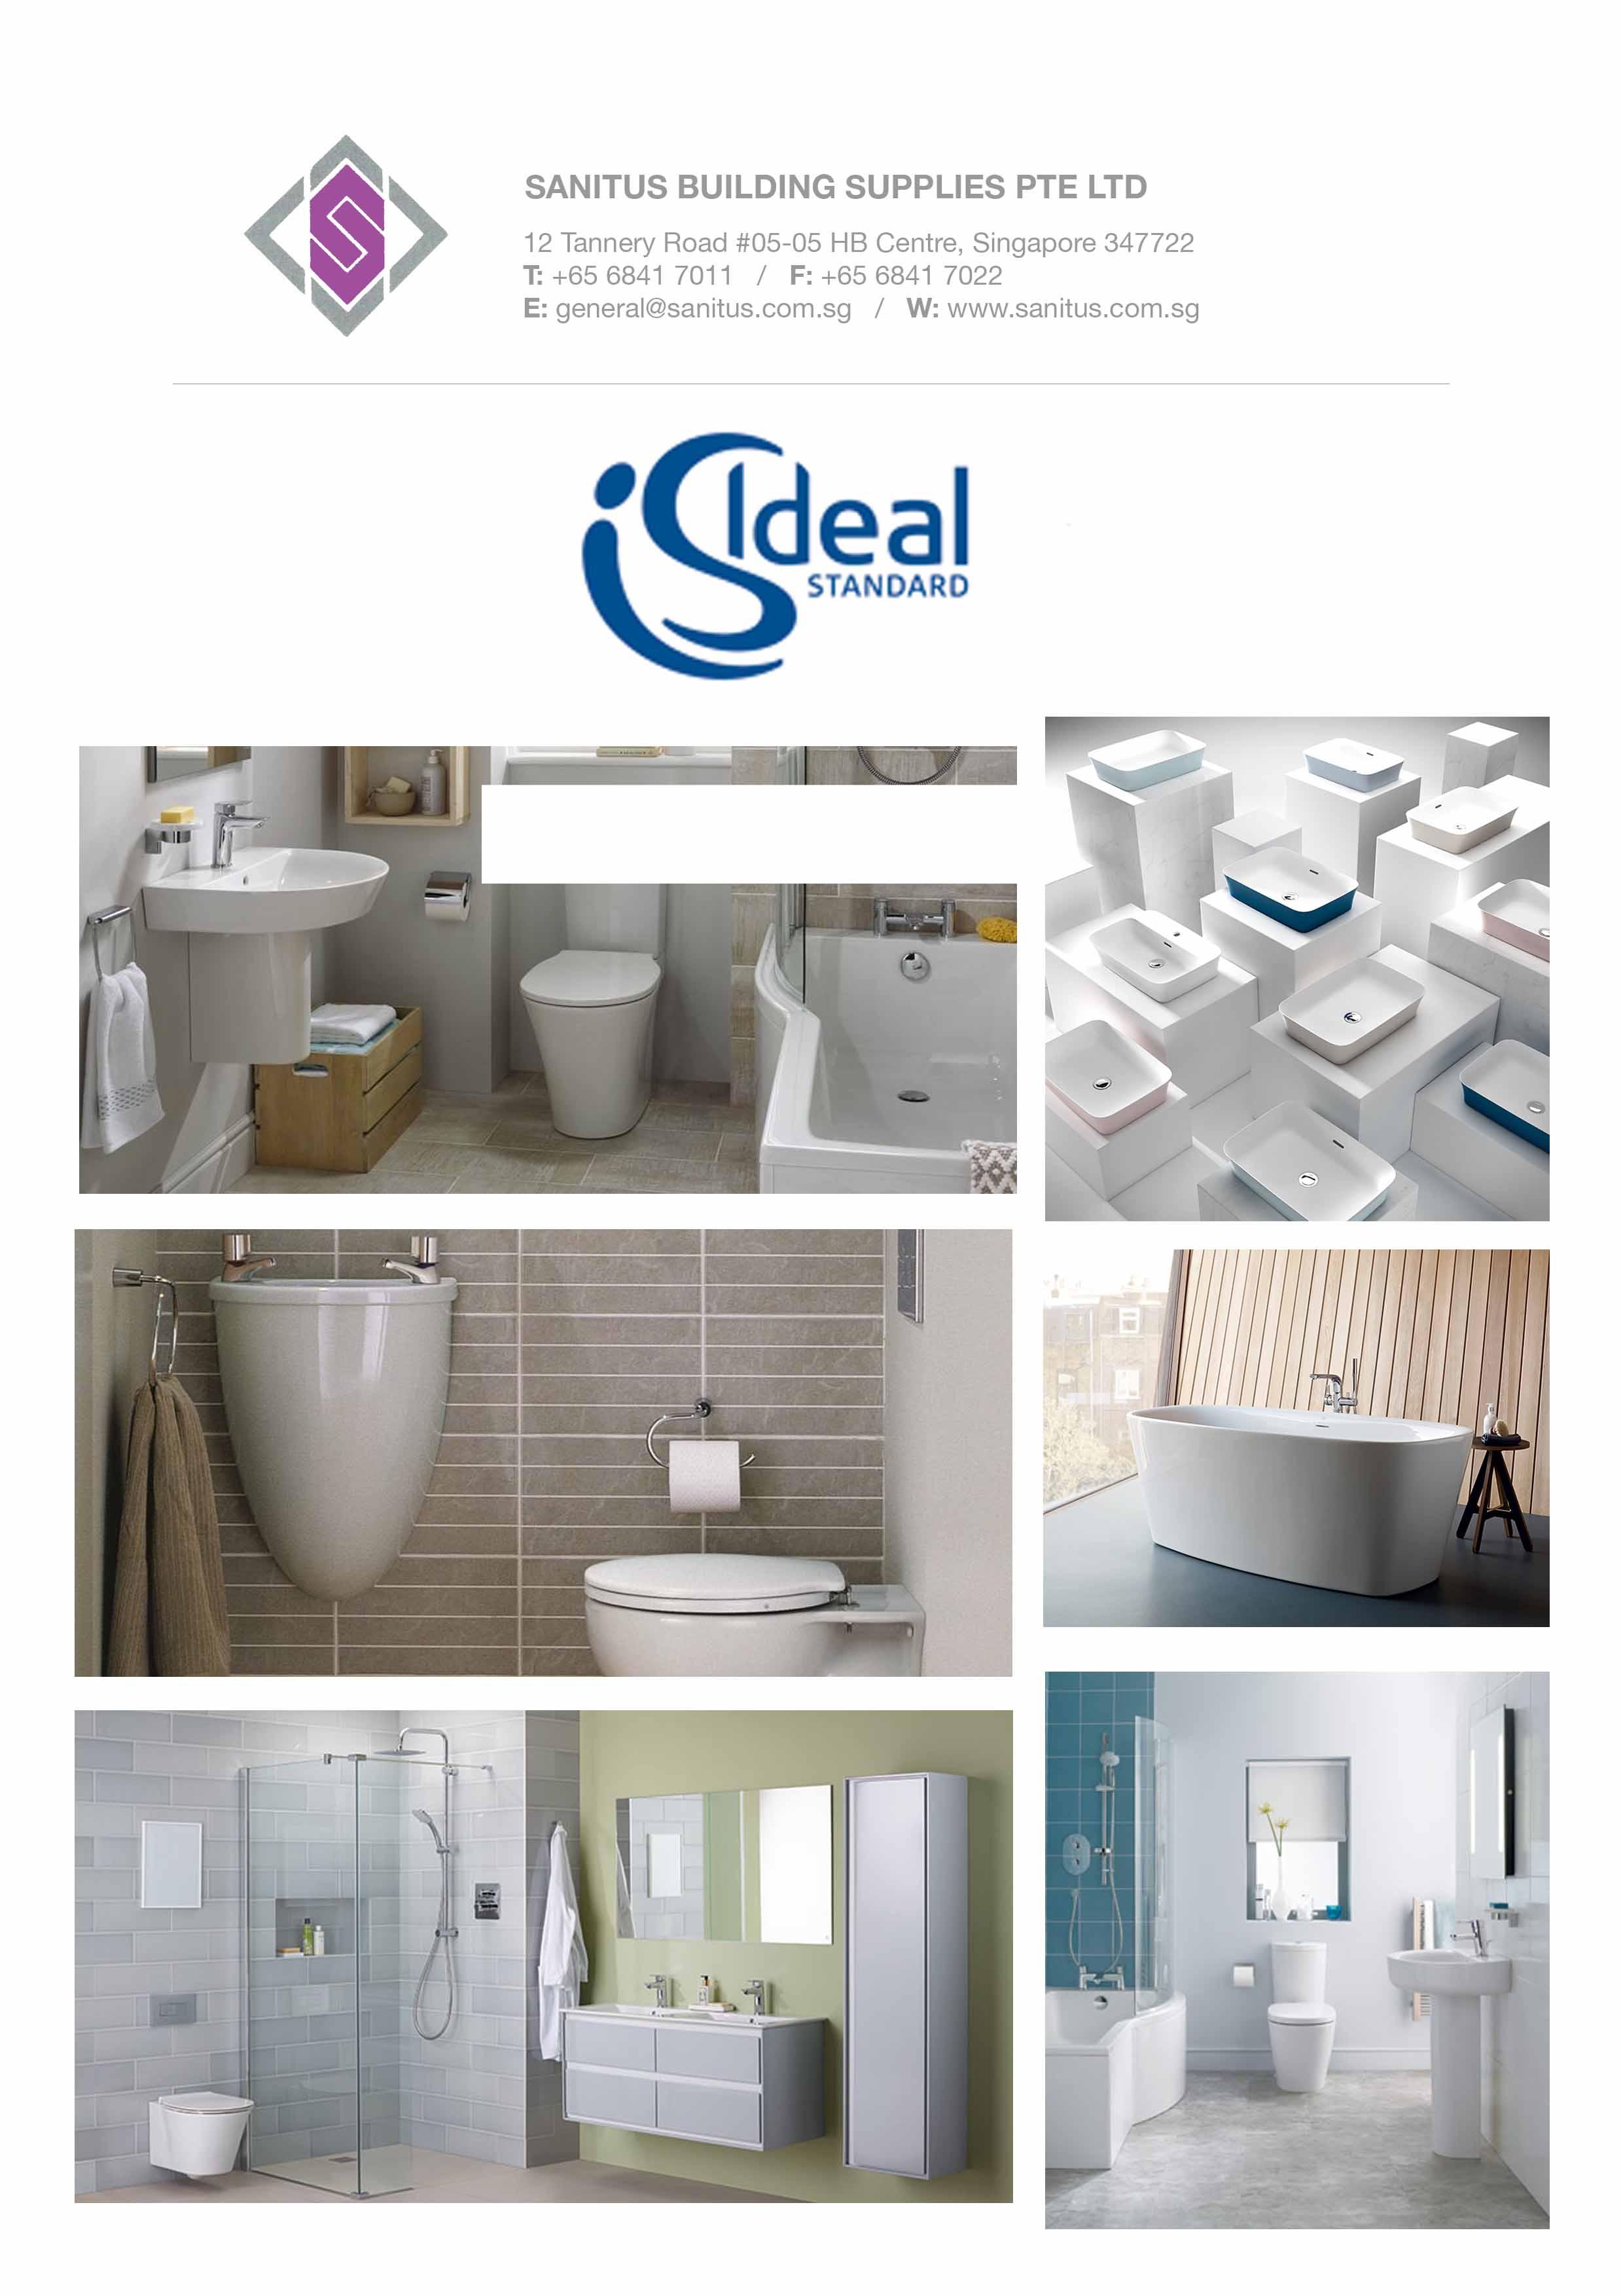 Ideal Standard Sanitus Building Supplies Pte Ltd